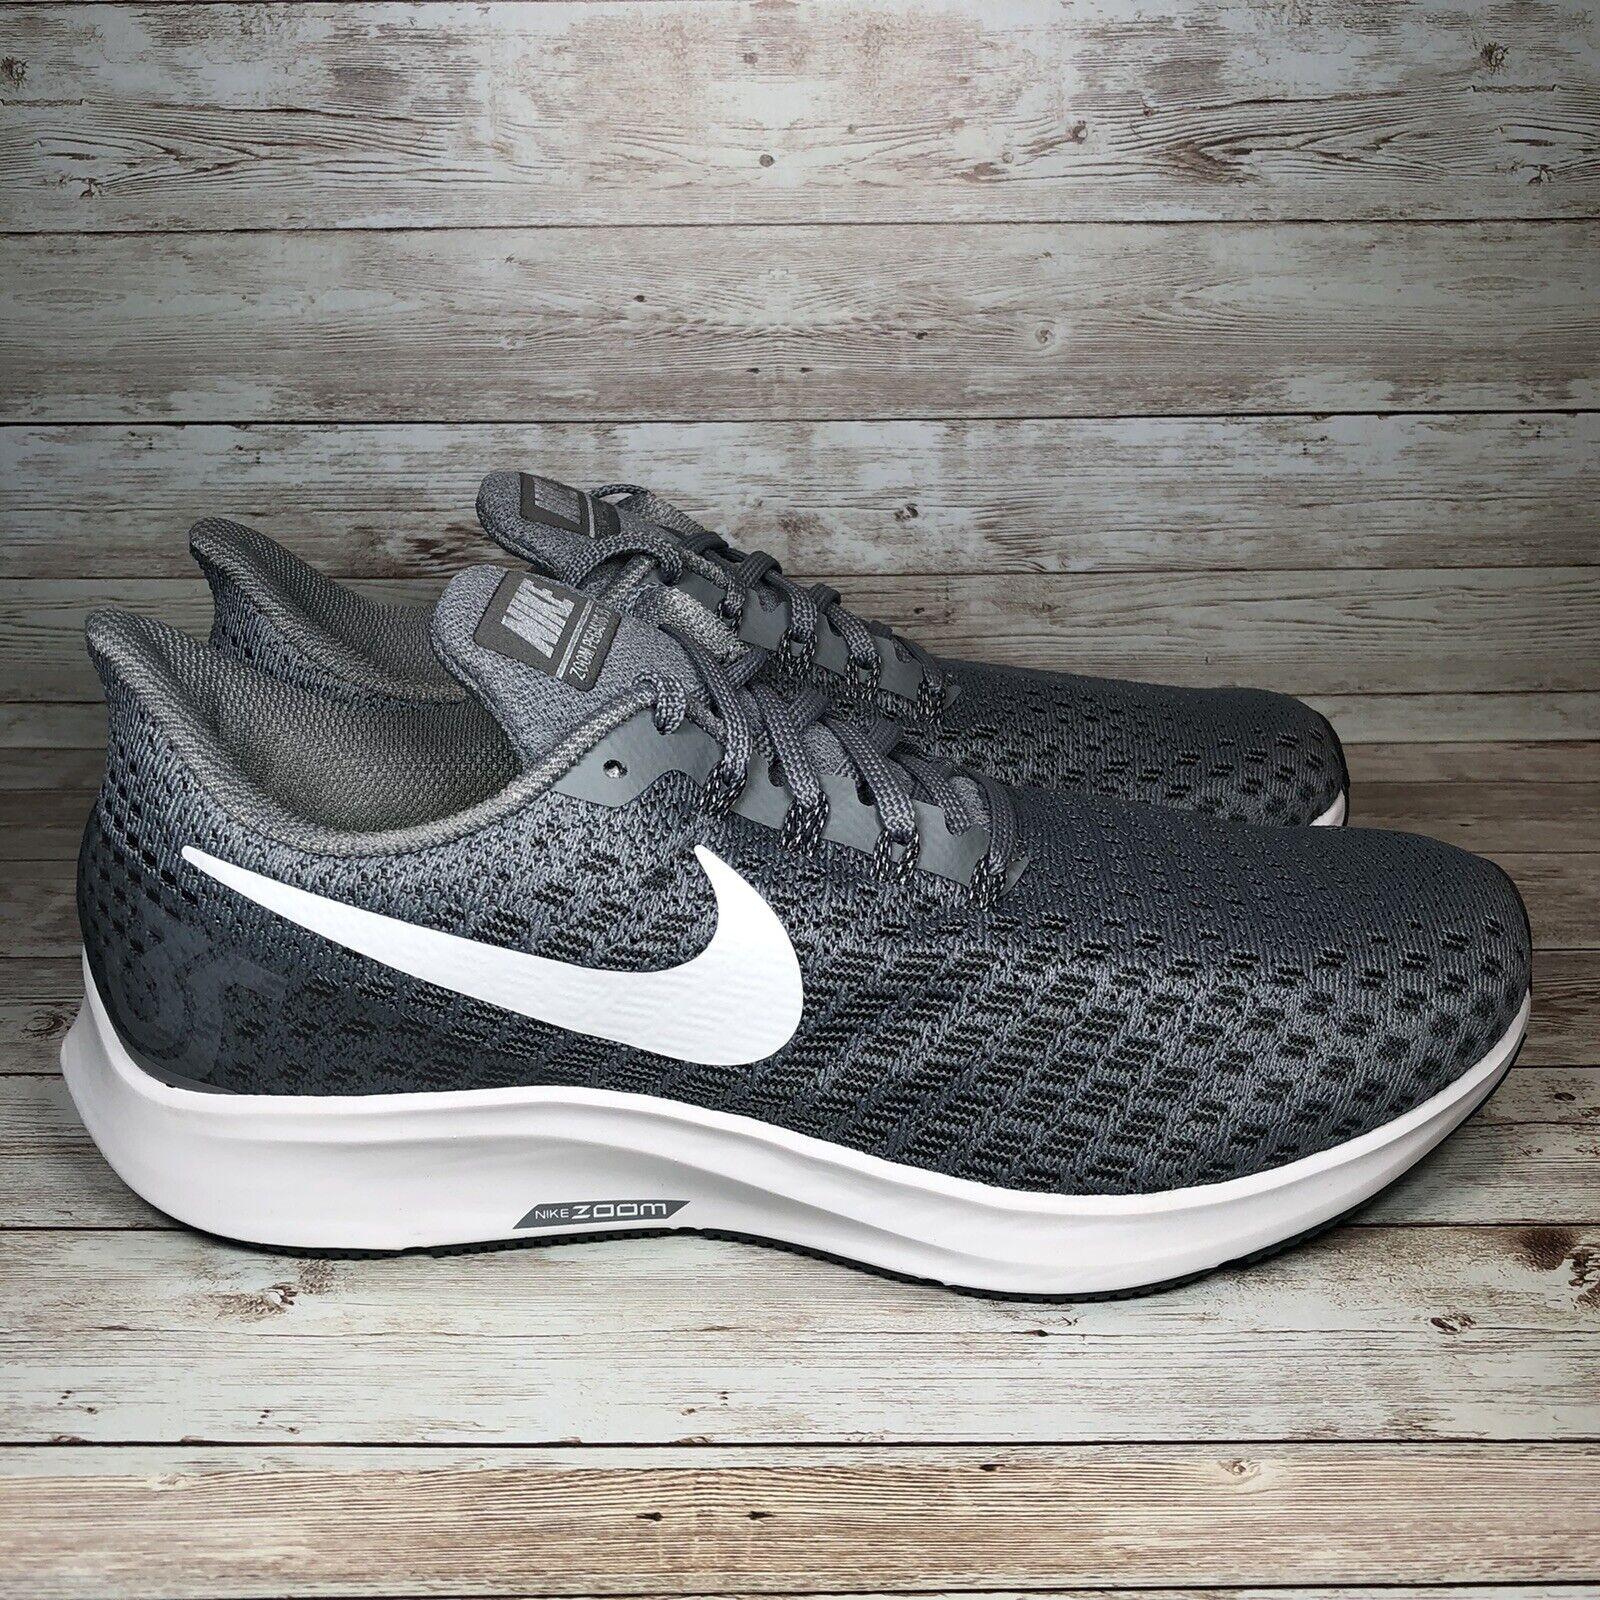 Nike Air Zoom Pegasus 35 купить на eBay